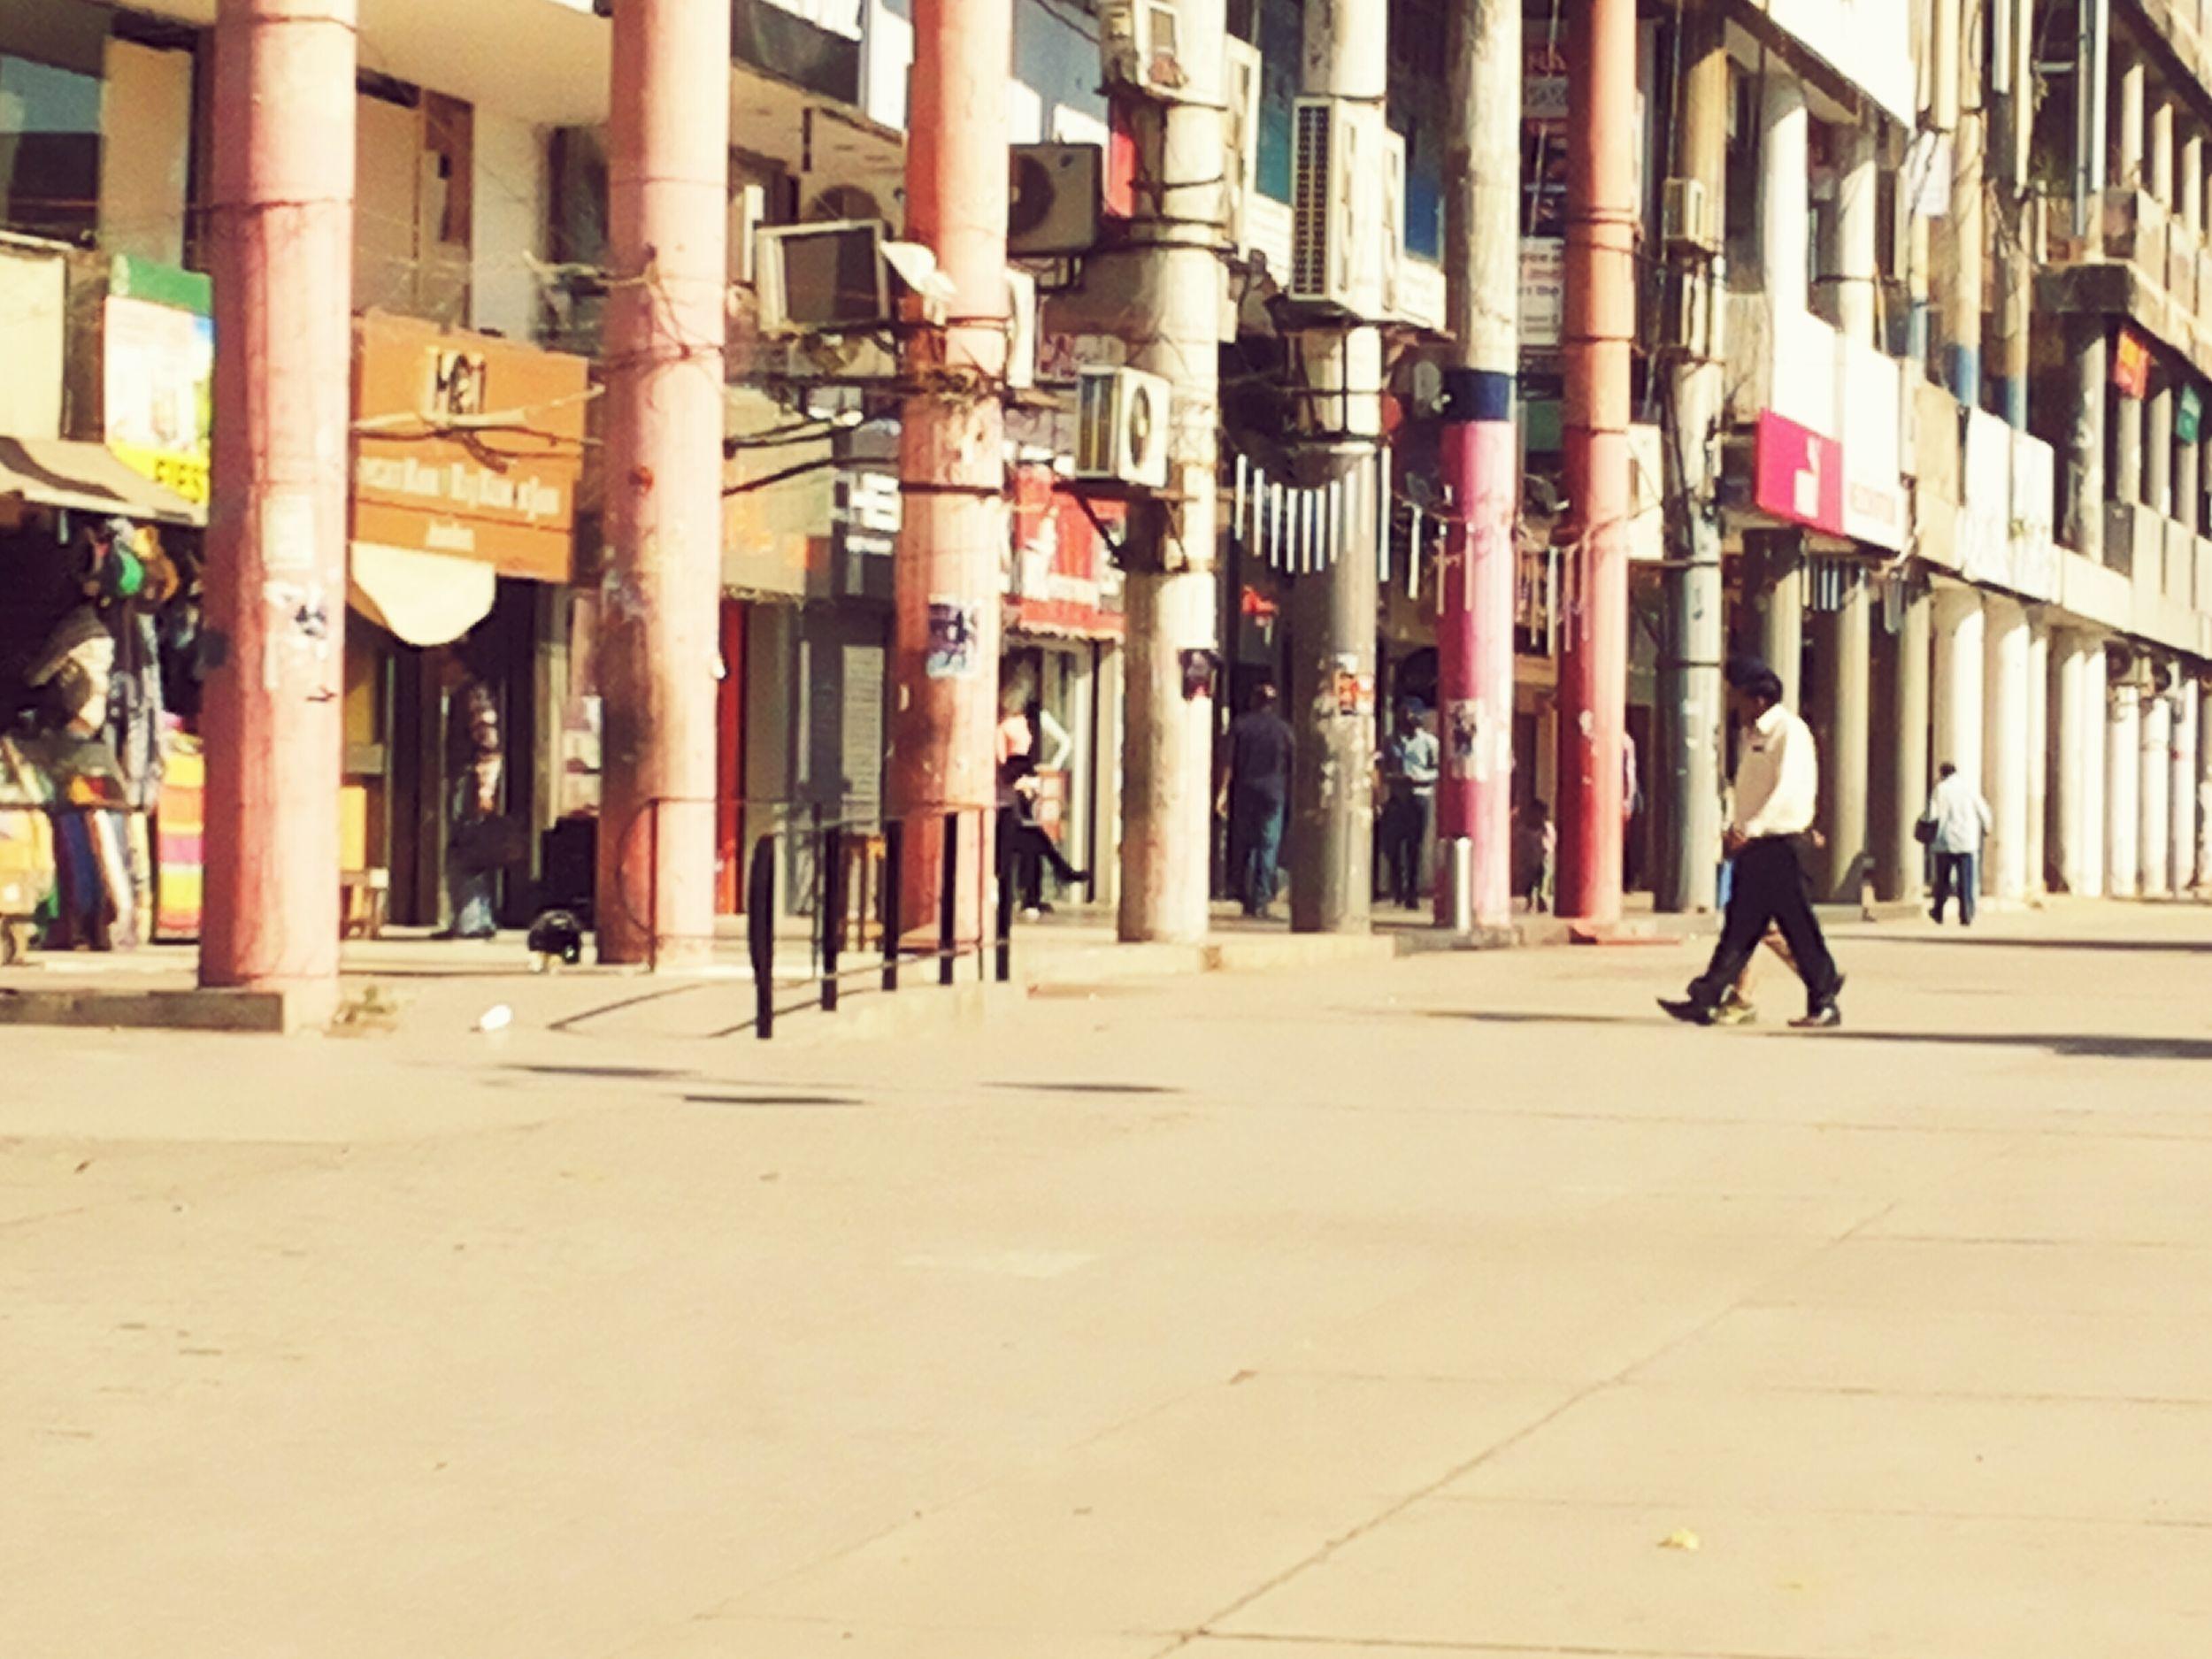 Urban Lifestyle Market India Sector7 Chandigarh People First Eyeem Photo